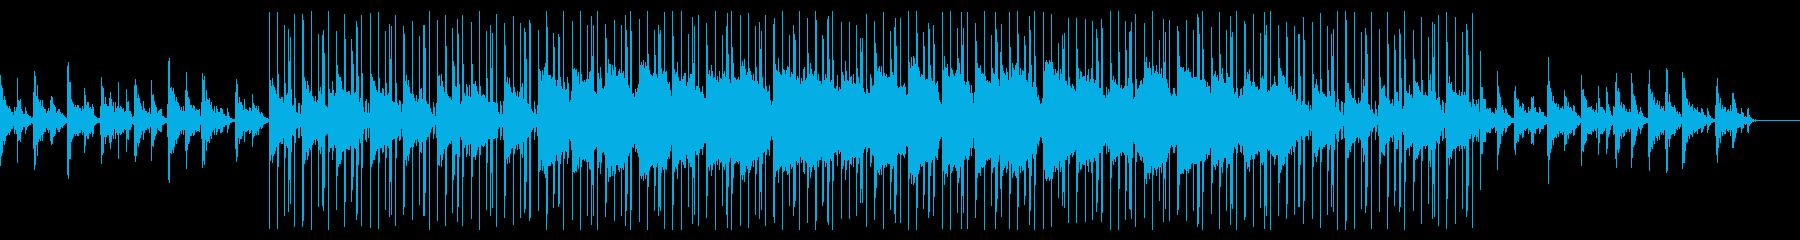 HipHop&Jazz風 エンディング曲の再生済みの波形